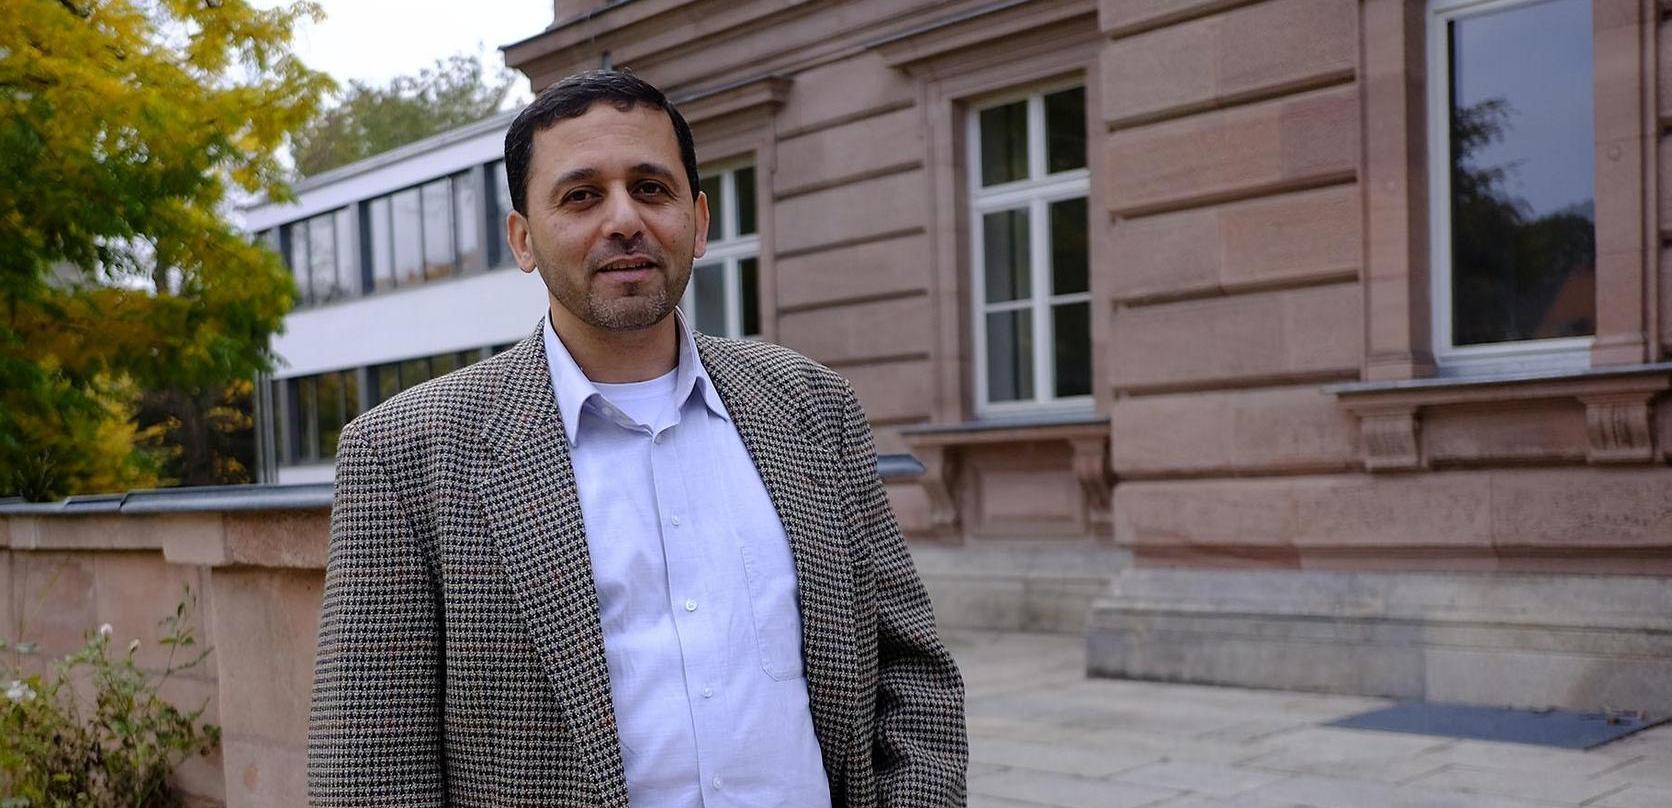 Professor Tarek Badawia unterrichtet an der Universität Erlangen-Nürnberg islamische Religionslehre.